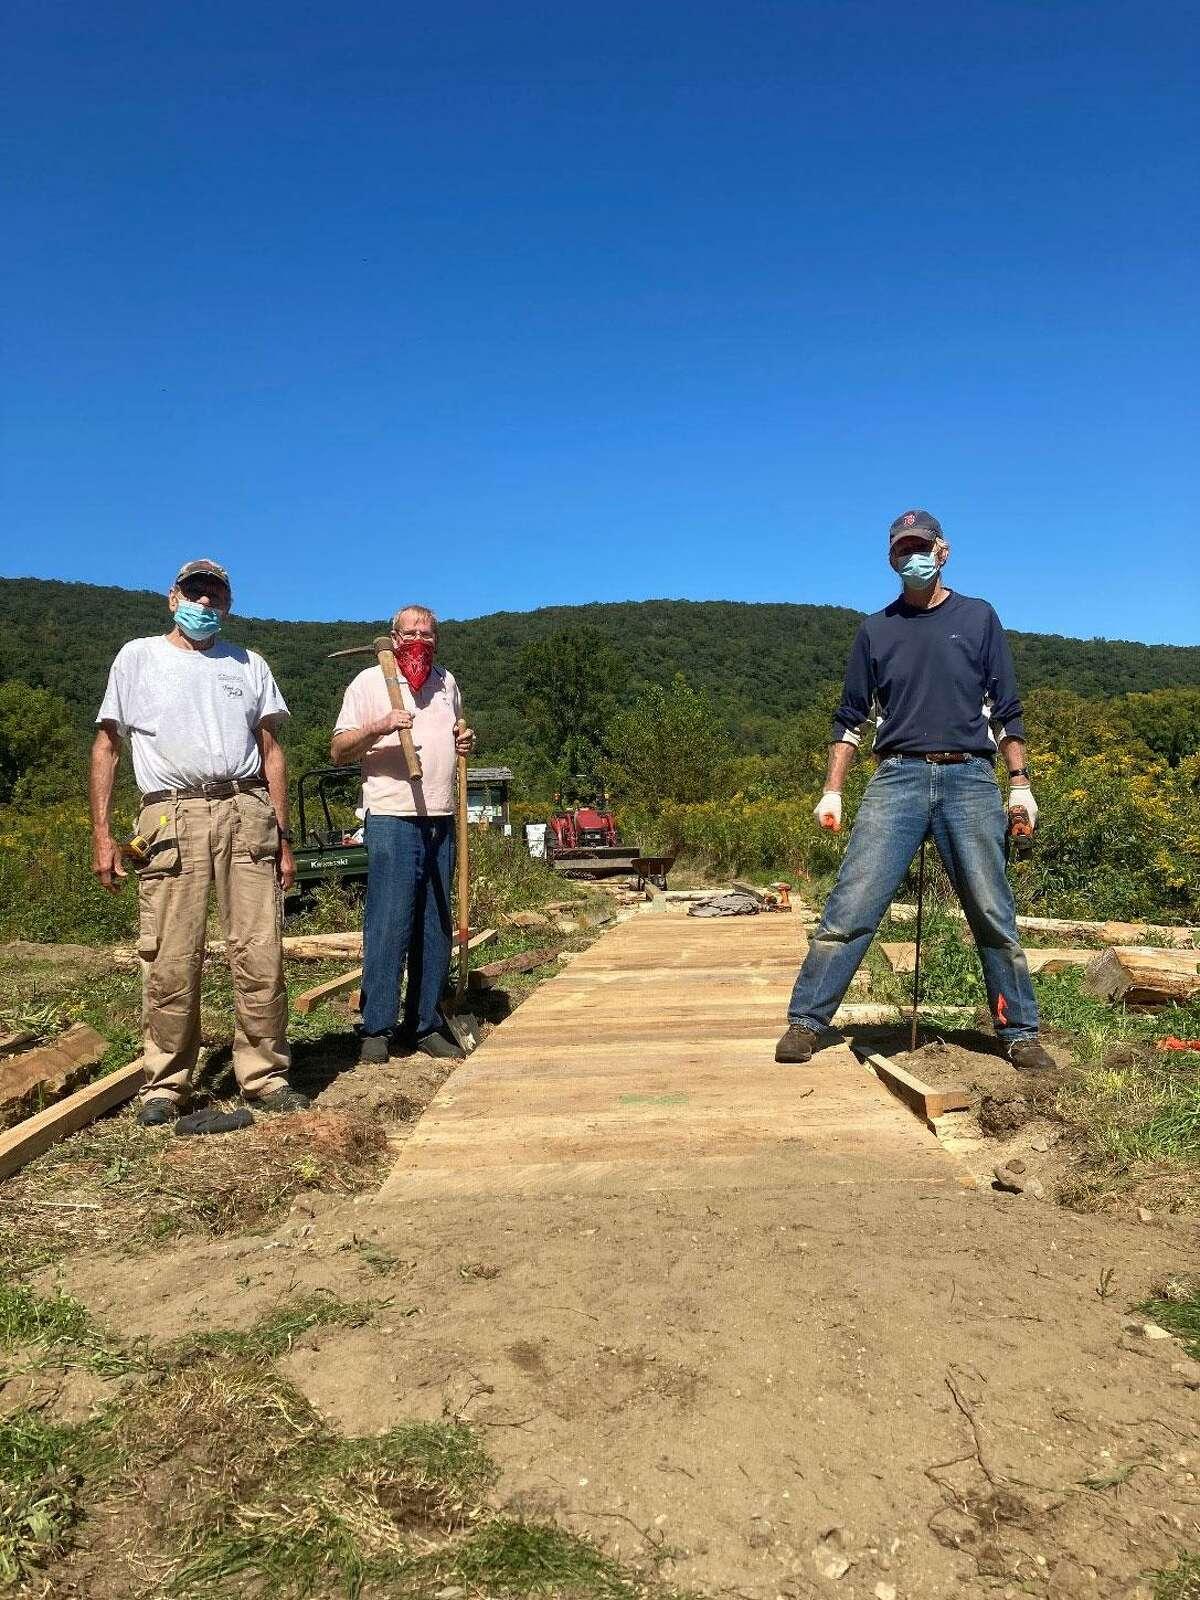 Volunteers help build a new boardwalk at Macricostas Preserve in 2020.